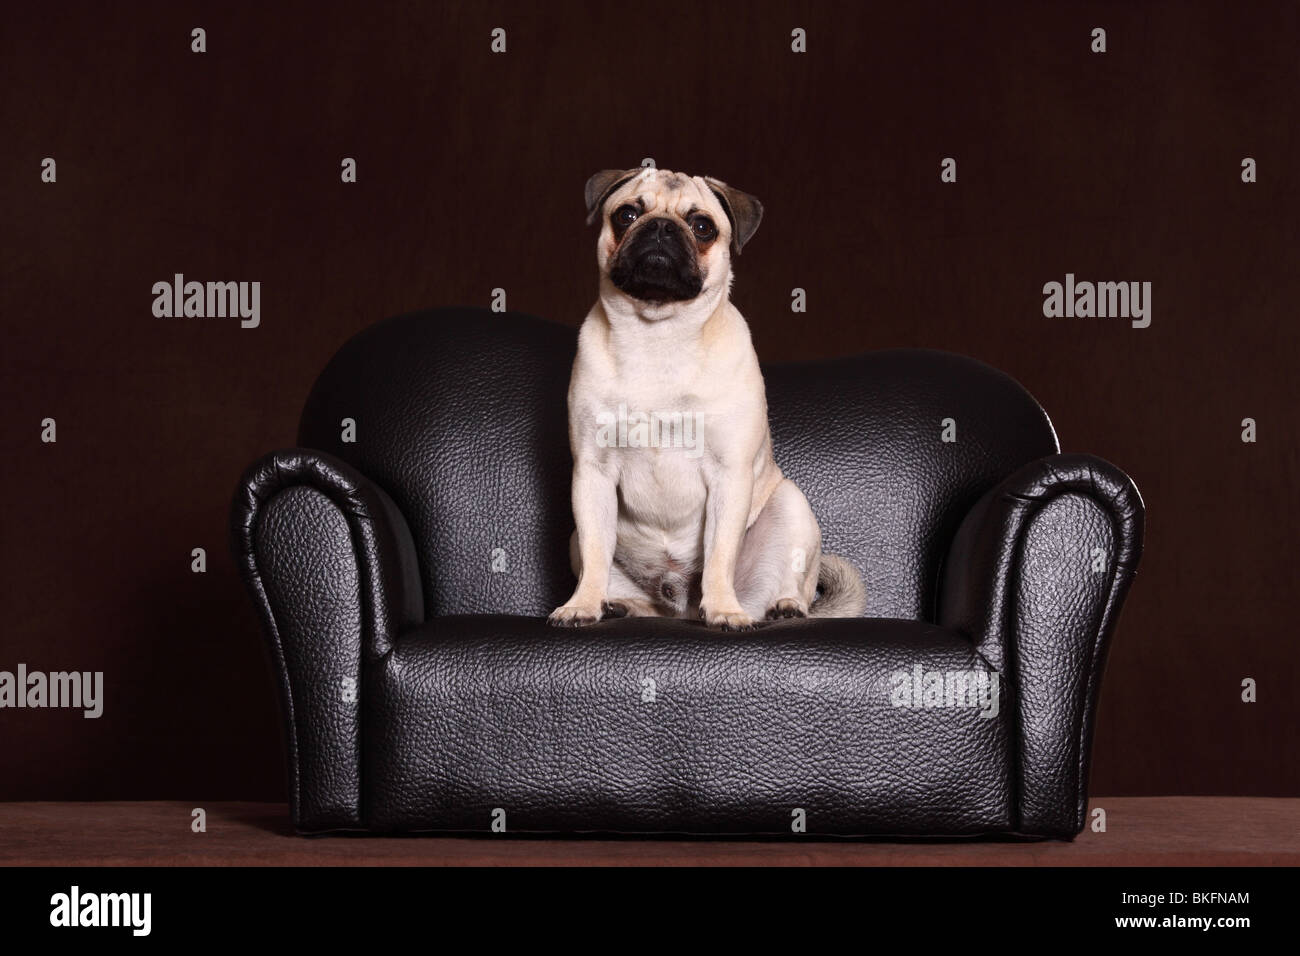 Mops / pug - Stock Image